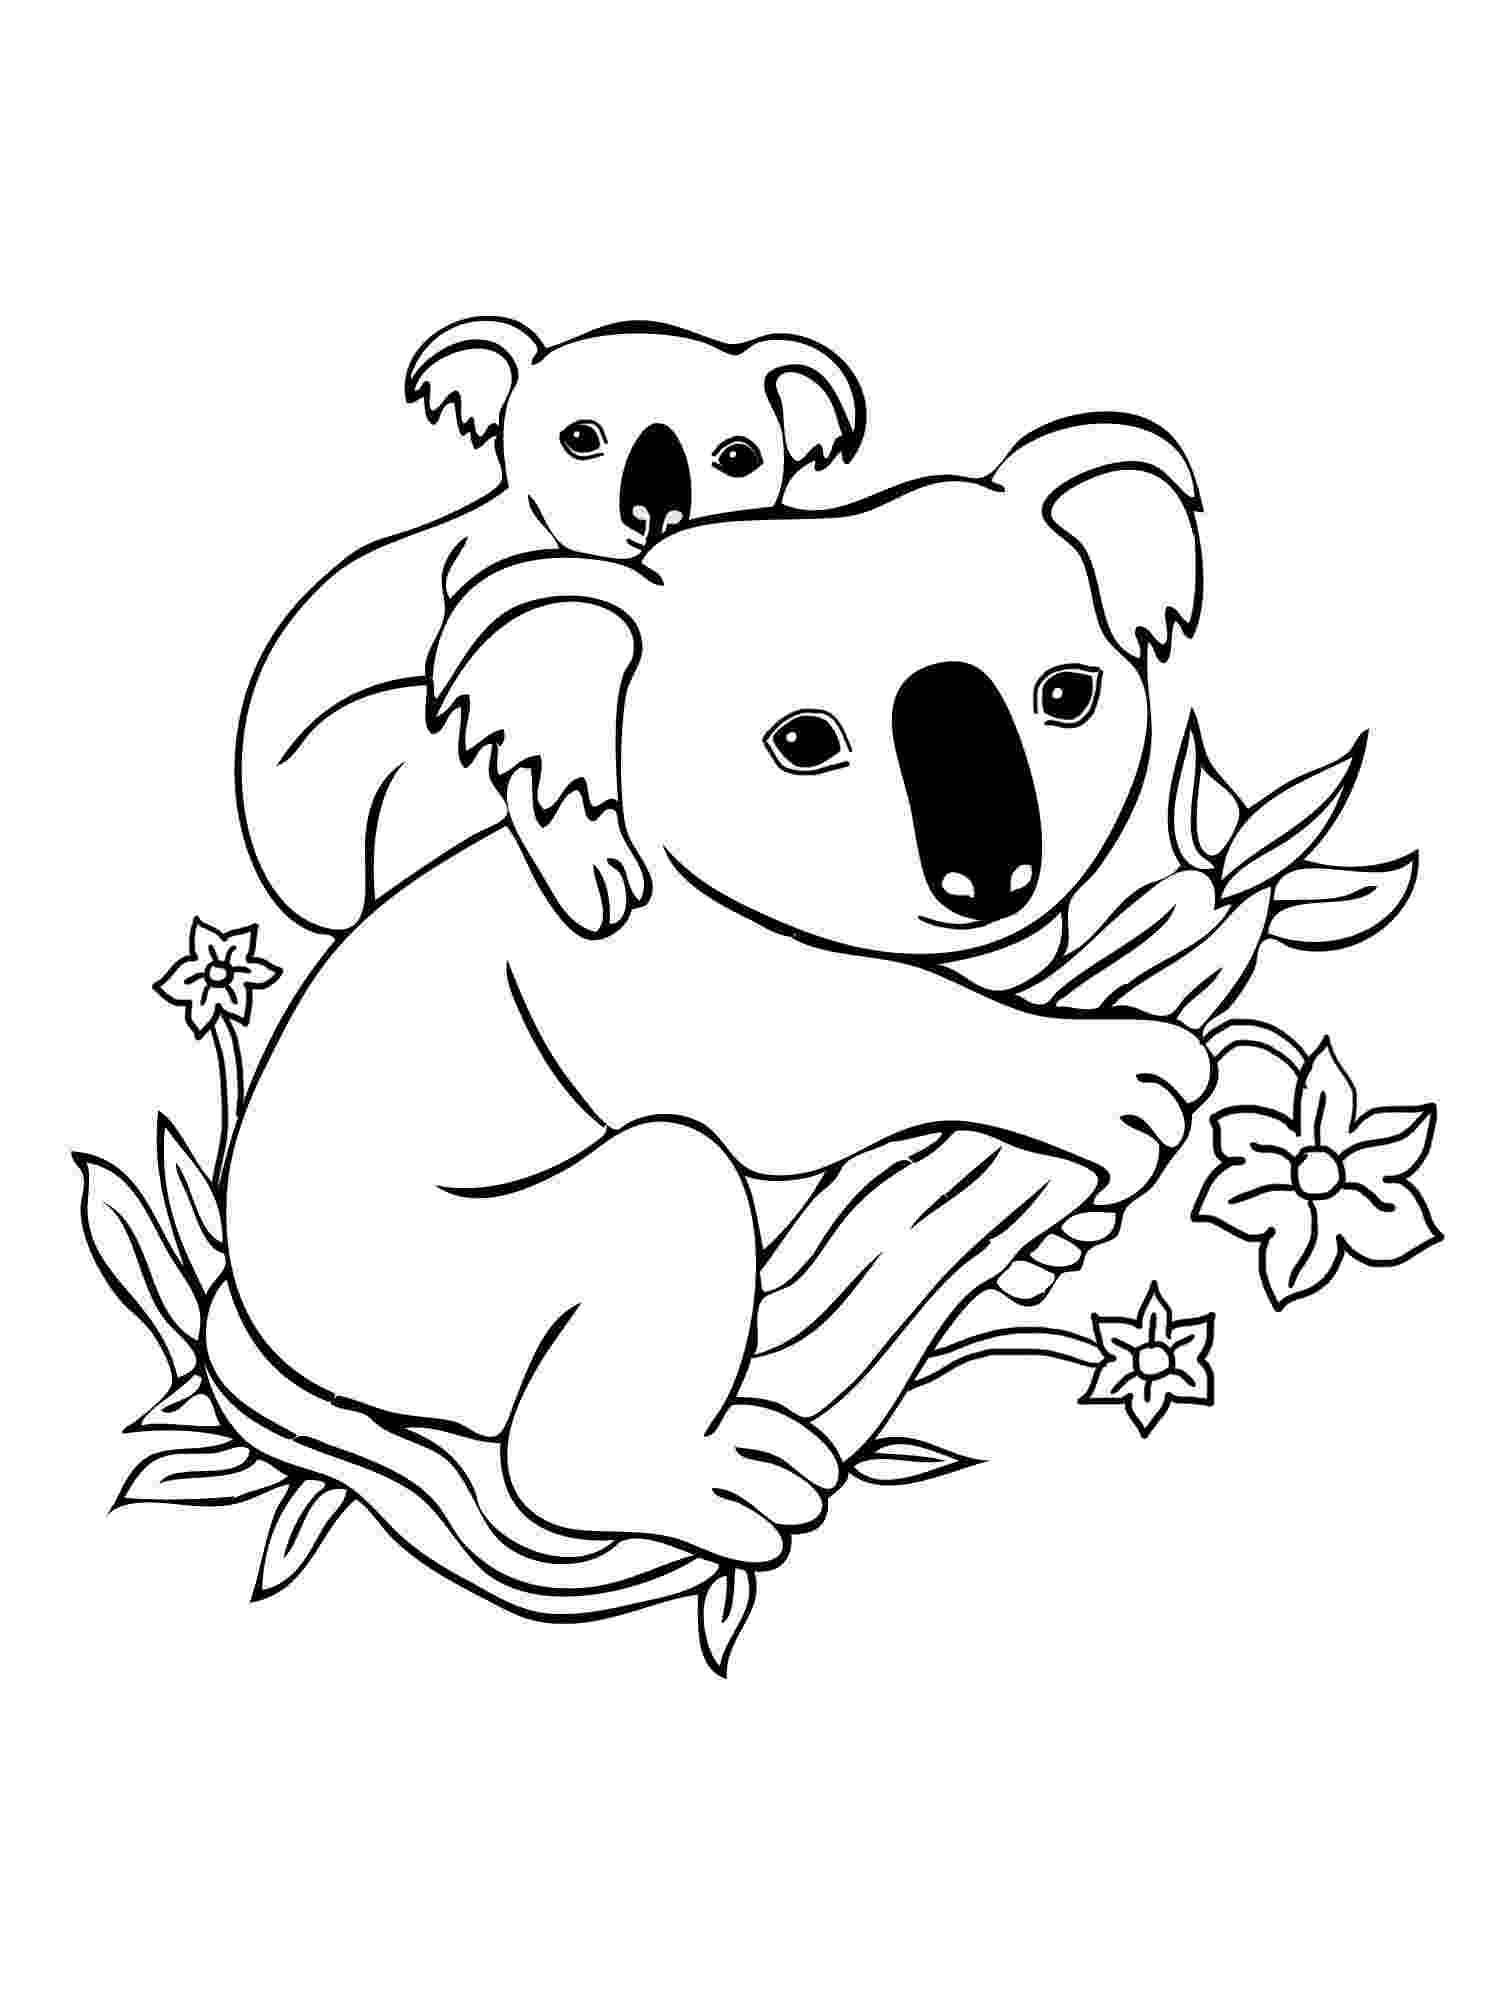 koala coloring pages koala coloring pages coloring pages koala